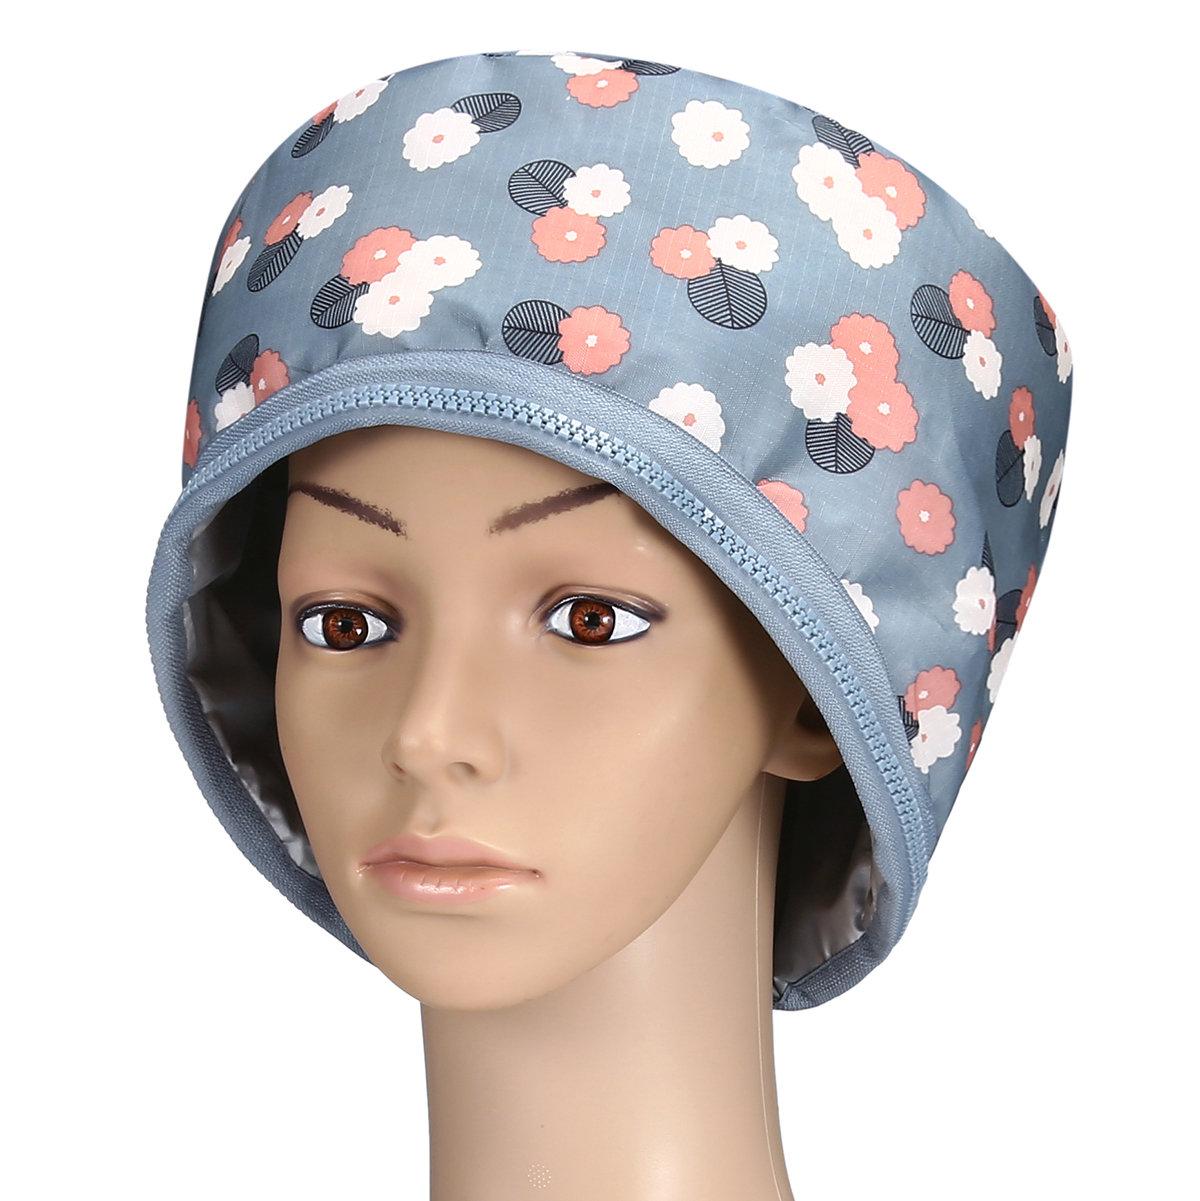 3 Datei Elektrische Kappe Heizkappe Startseite Haarpflegekappe Haarmaske Haar Scalp Treatments